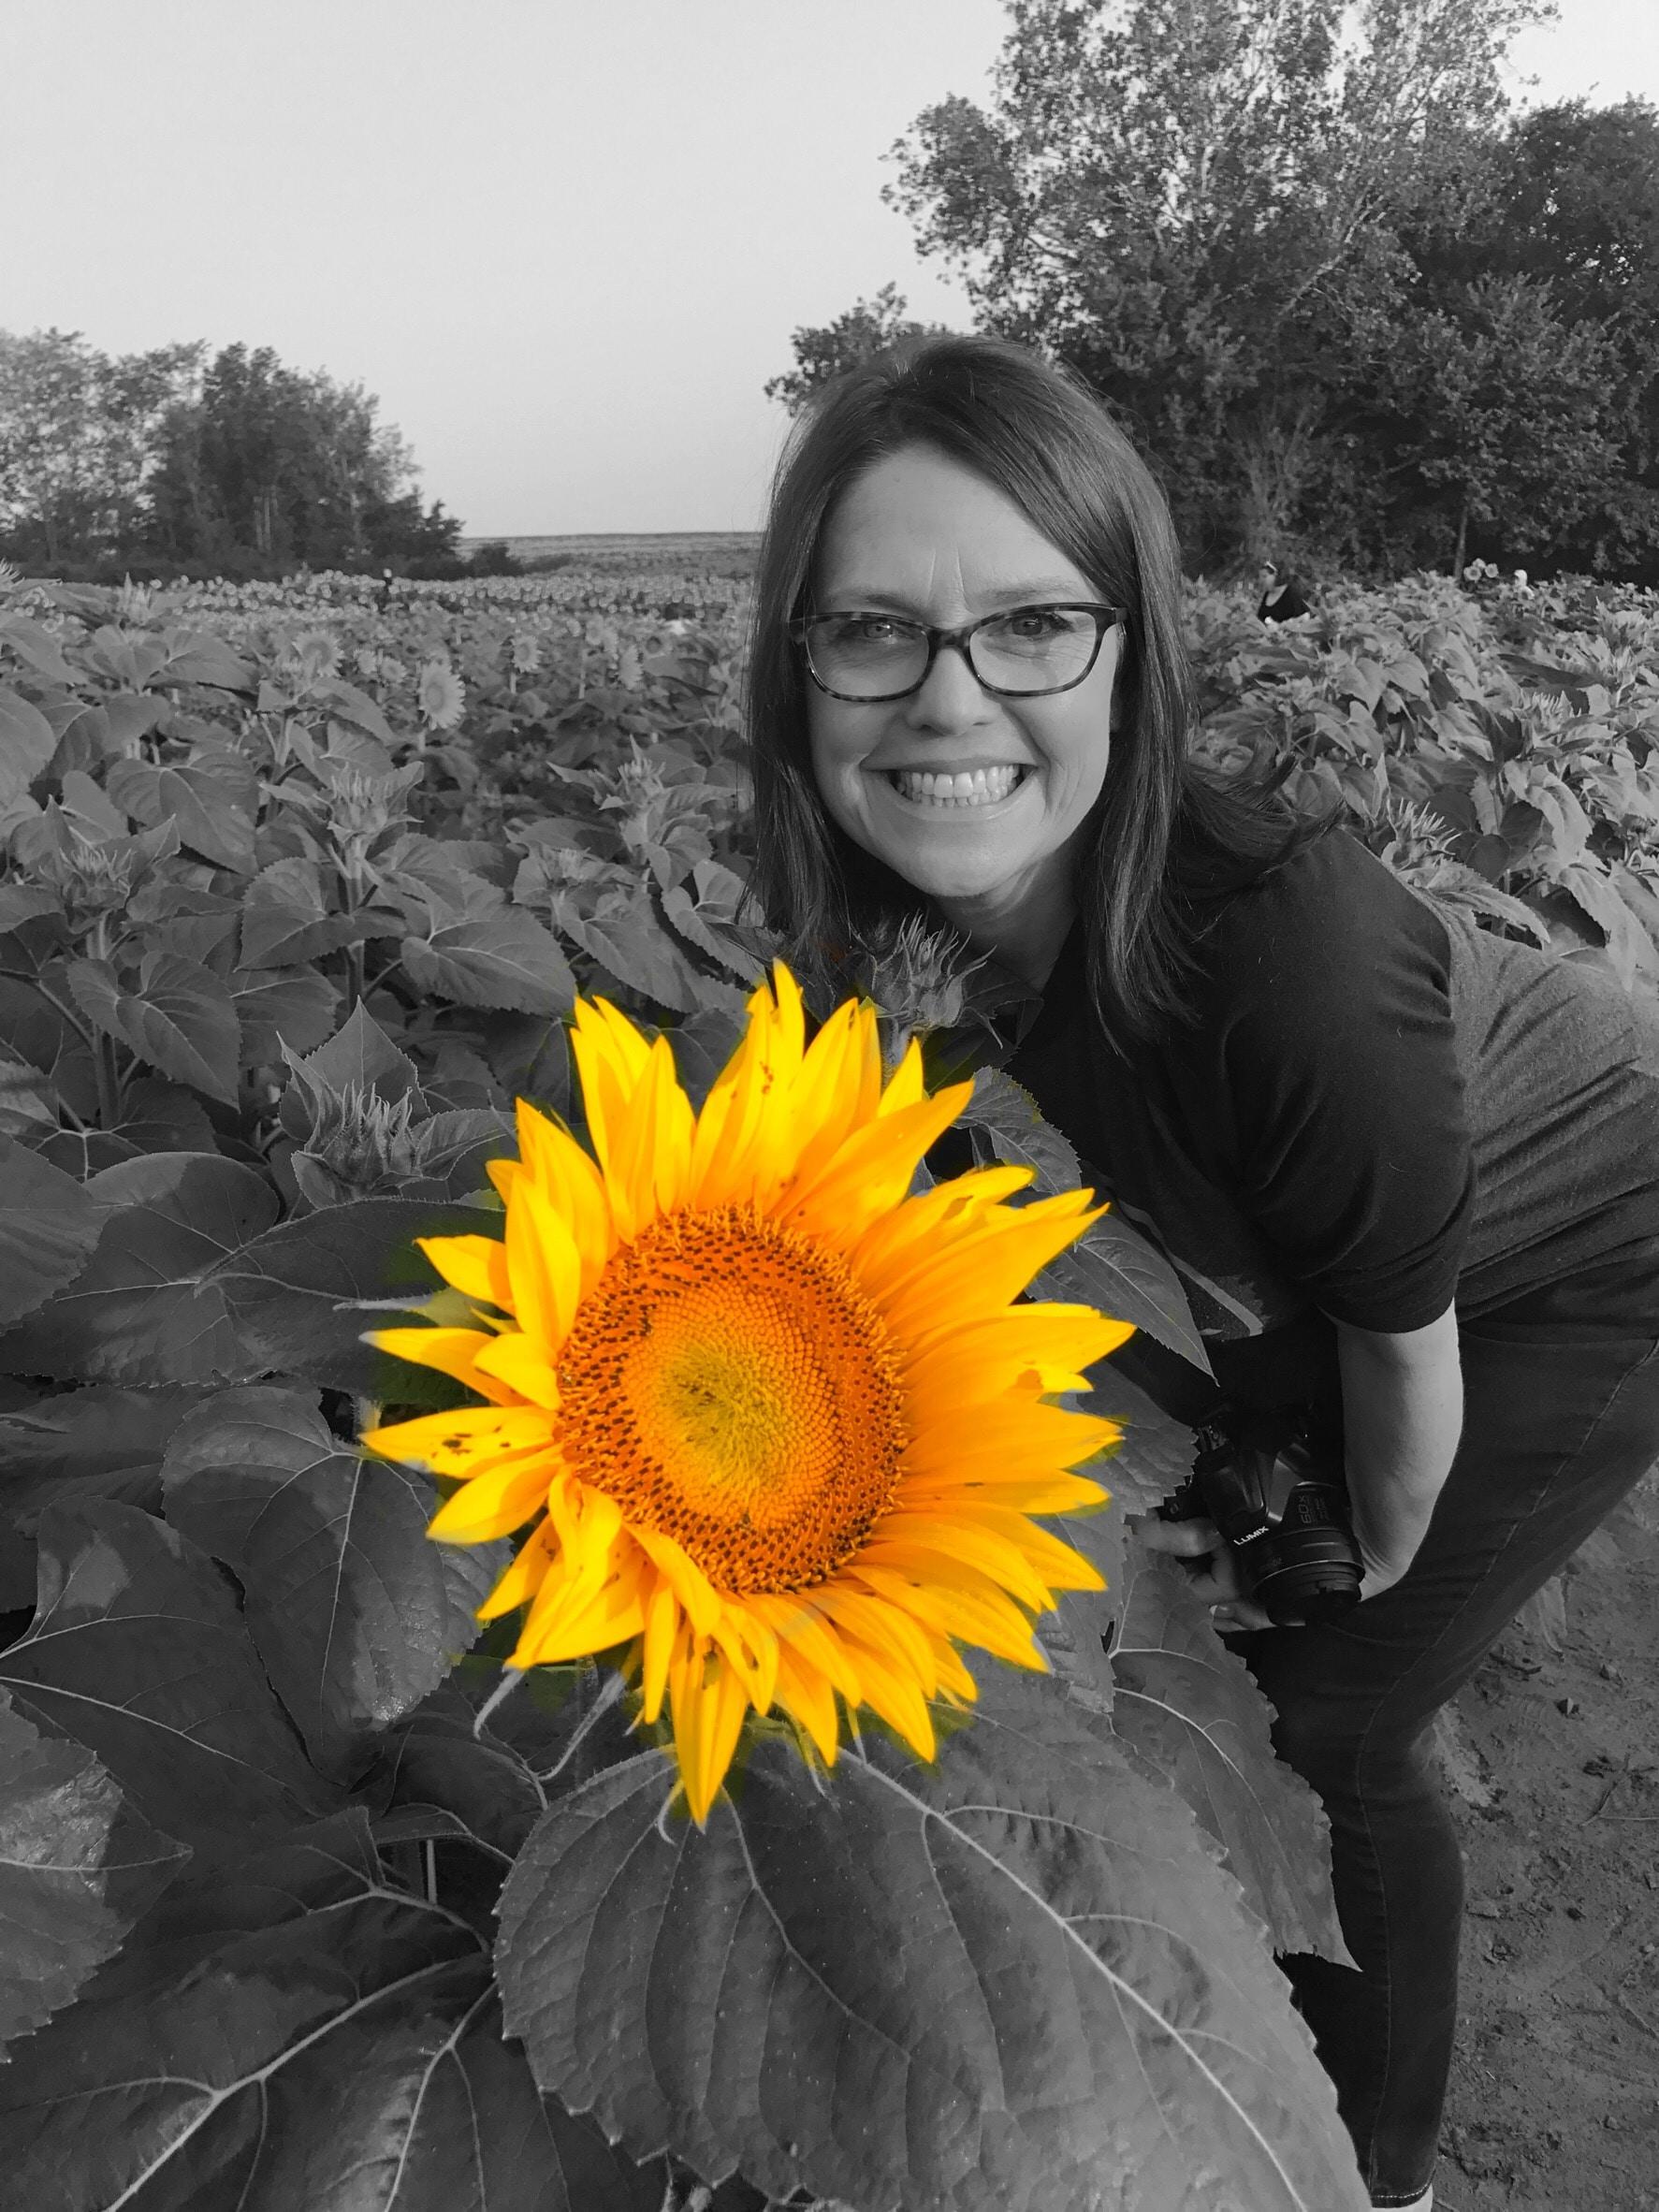 Go to Laura Gilchrist's profile